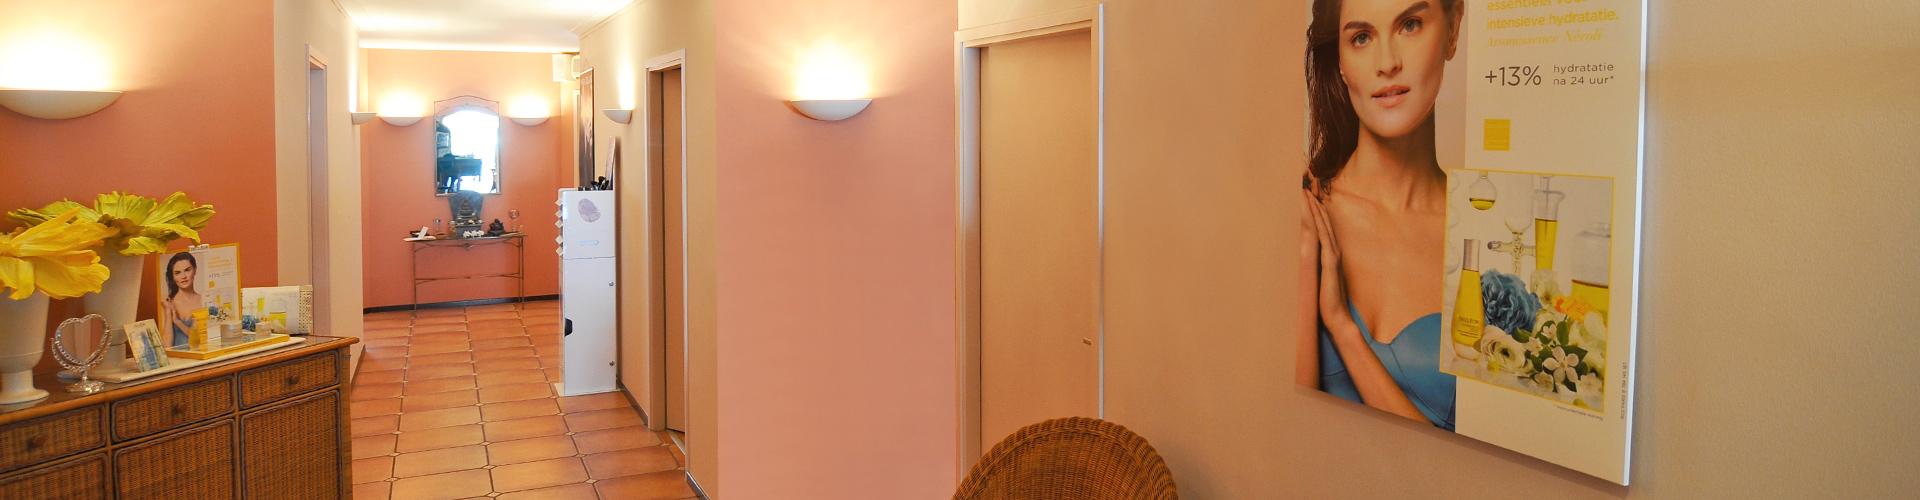 hd-salon-binnen4